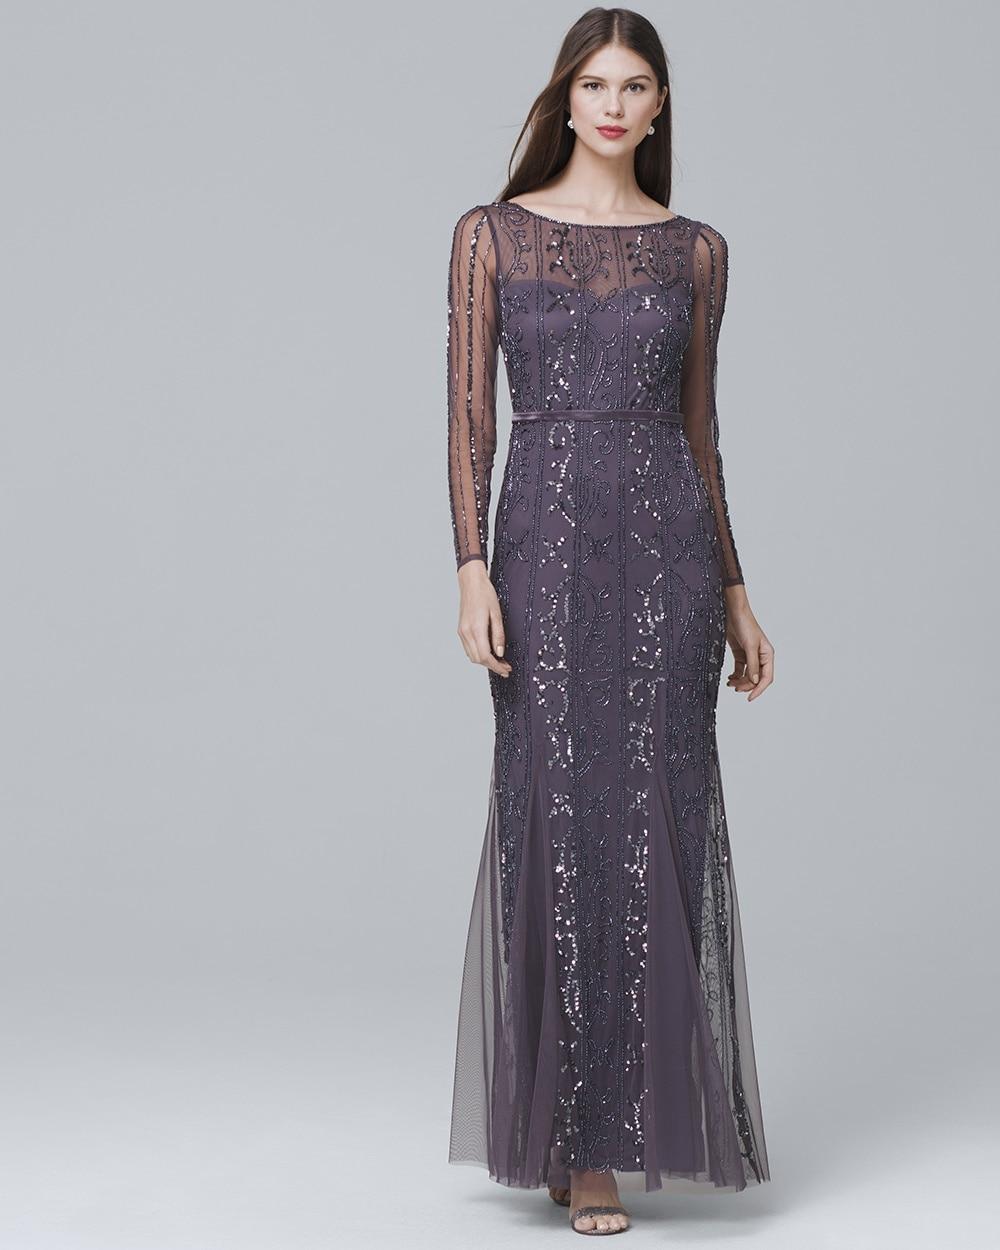 Long-Sleeve Beaded Gown - White House Black Market